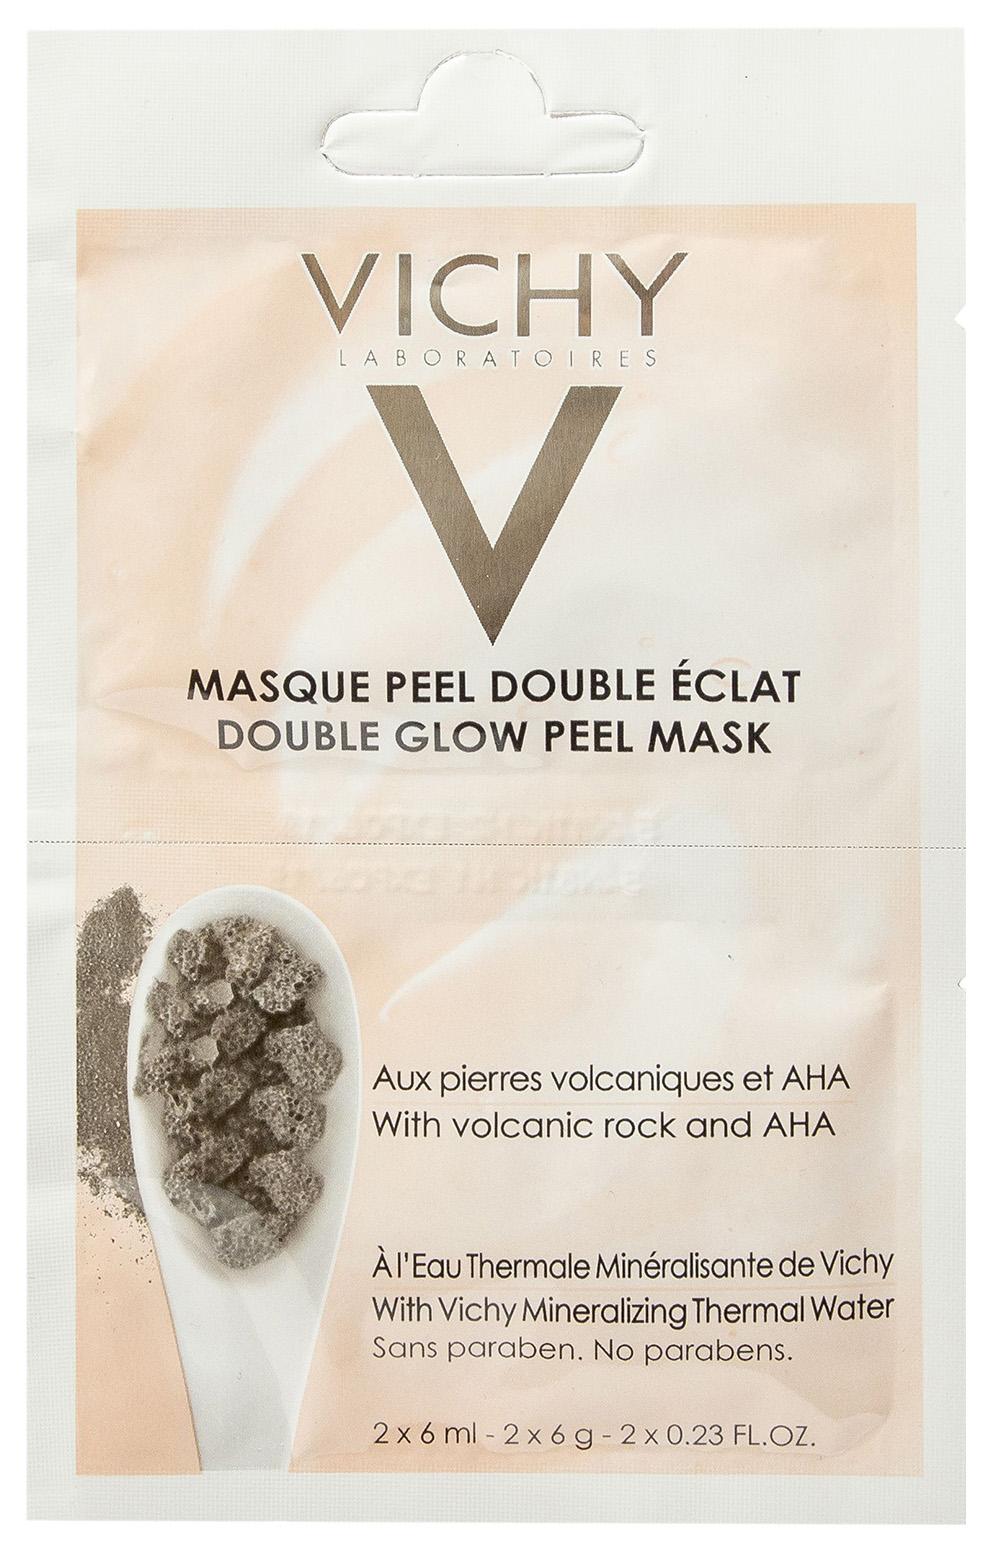 Маска для лица Vichy Двойное сияние 2 шт х 6 мл фото